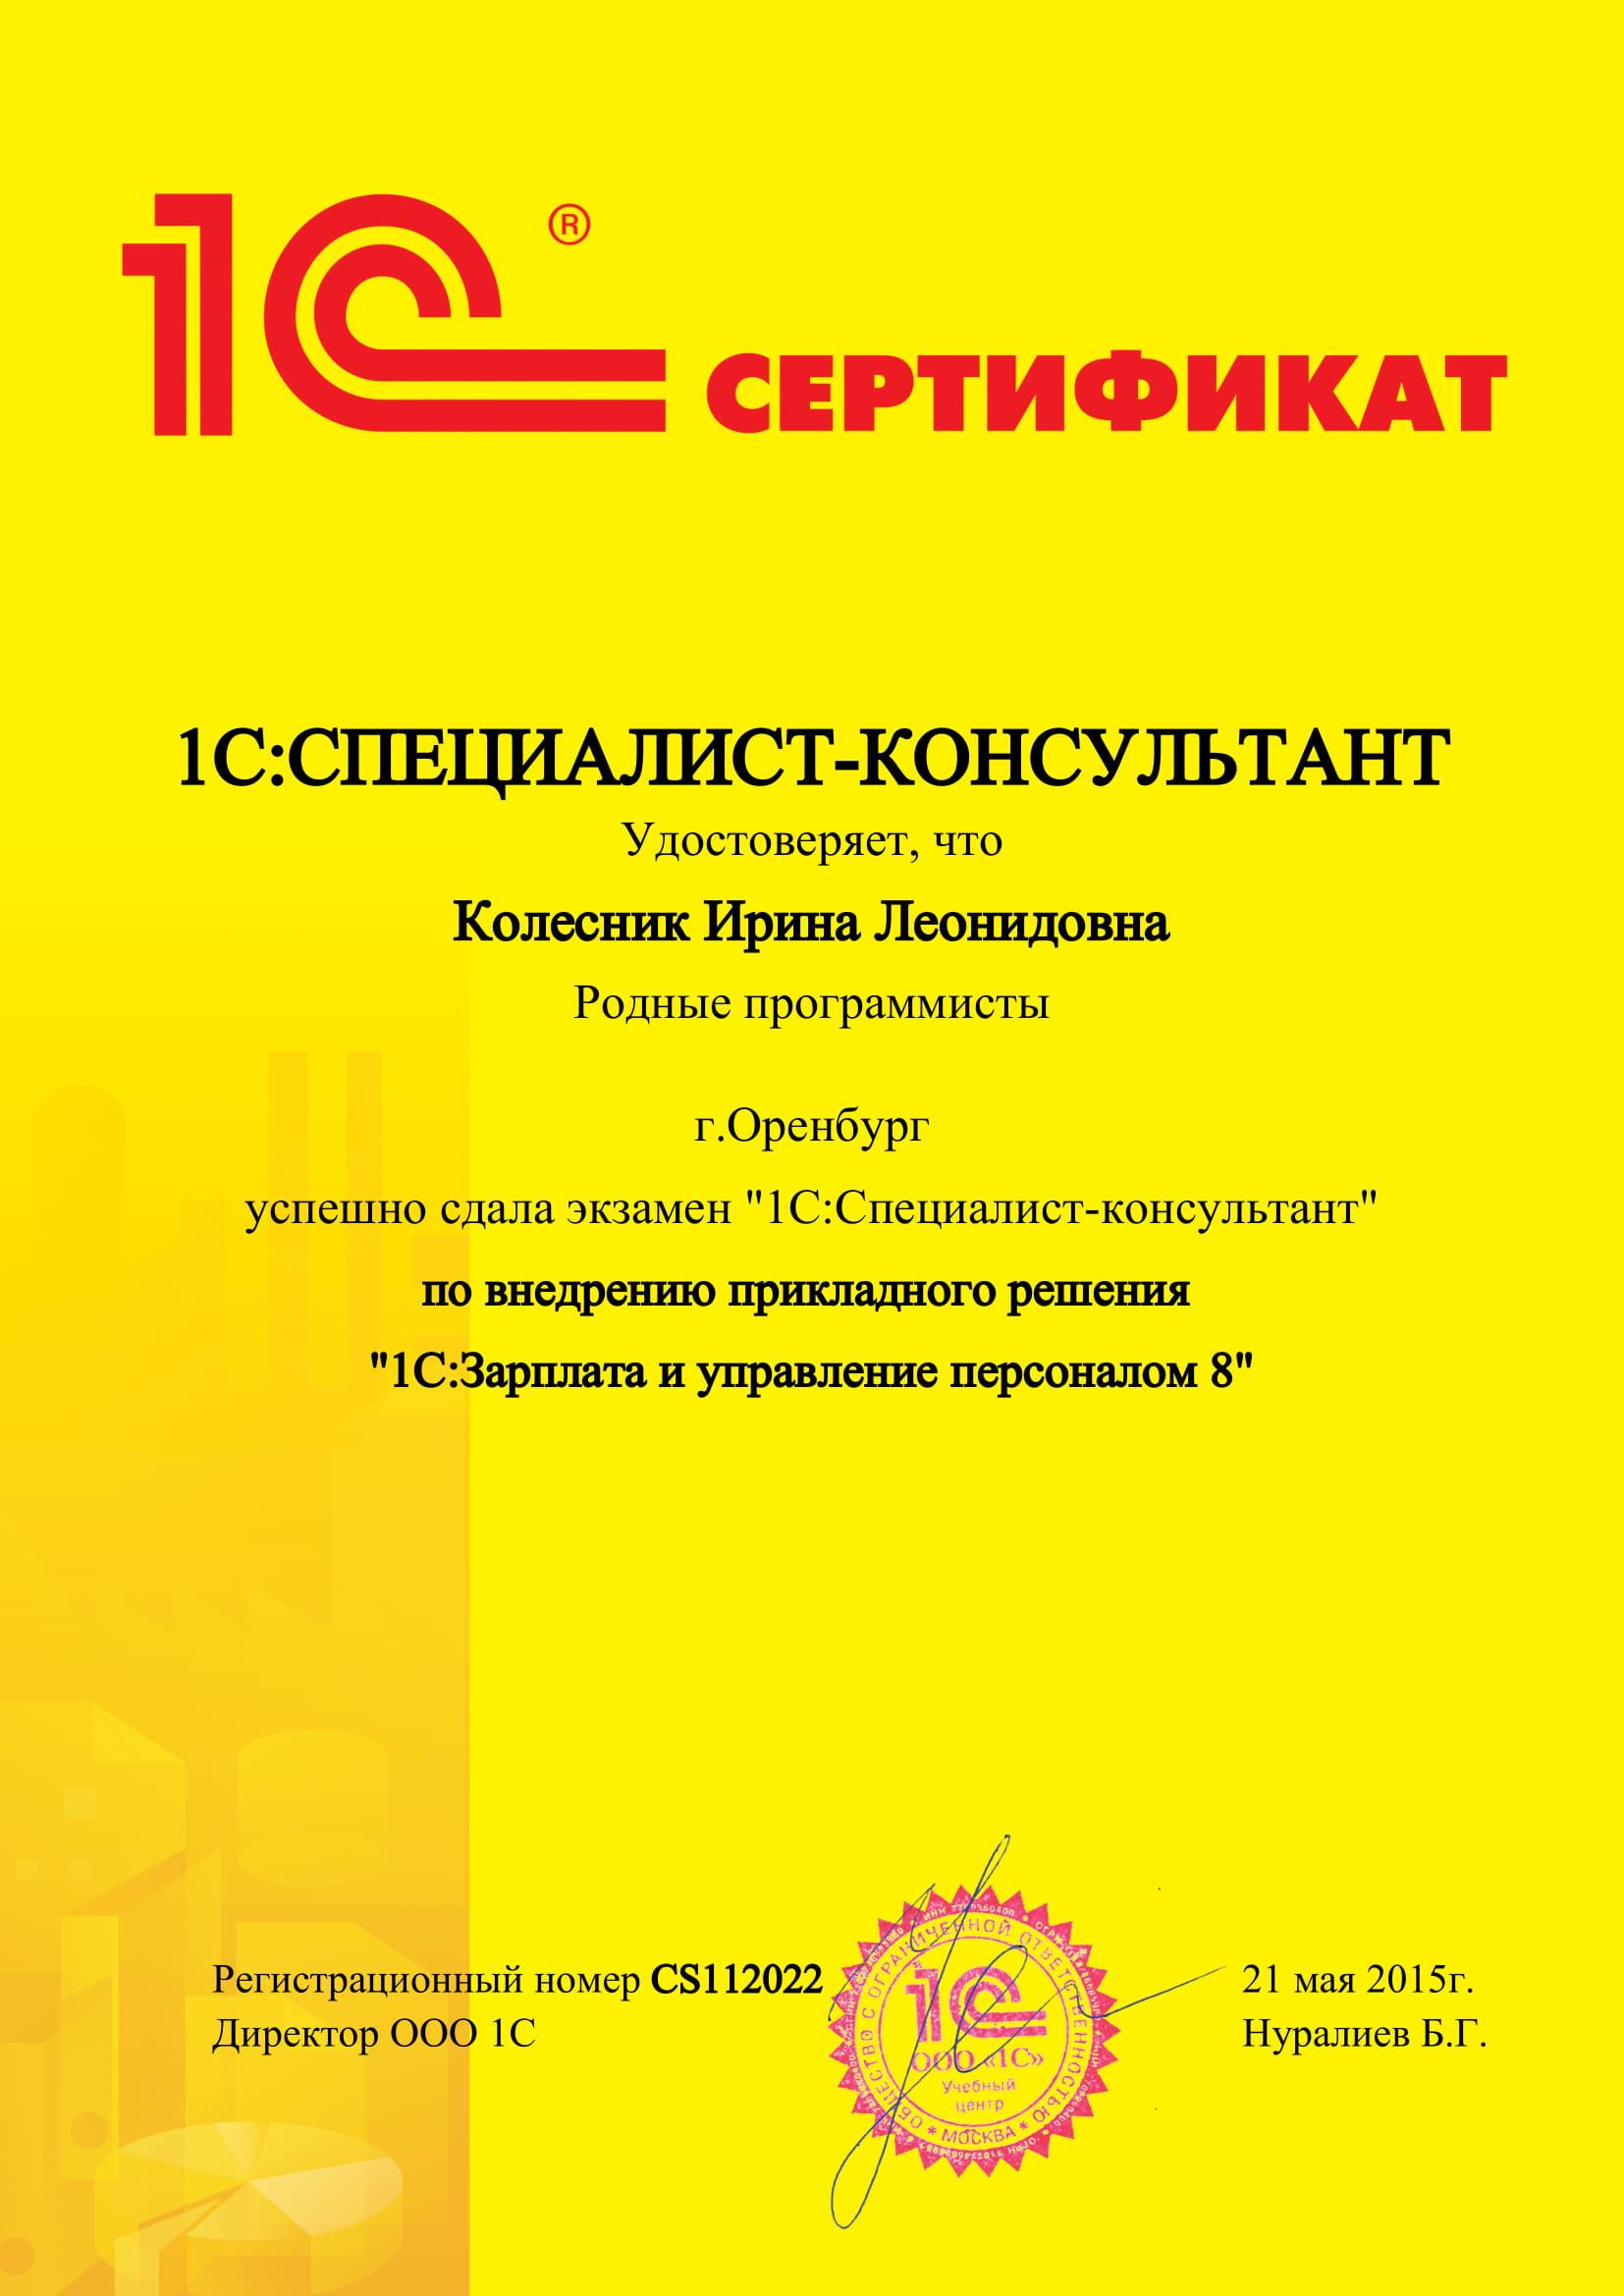 Колесник Ирина специалист консультант ЗУП-1